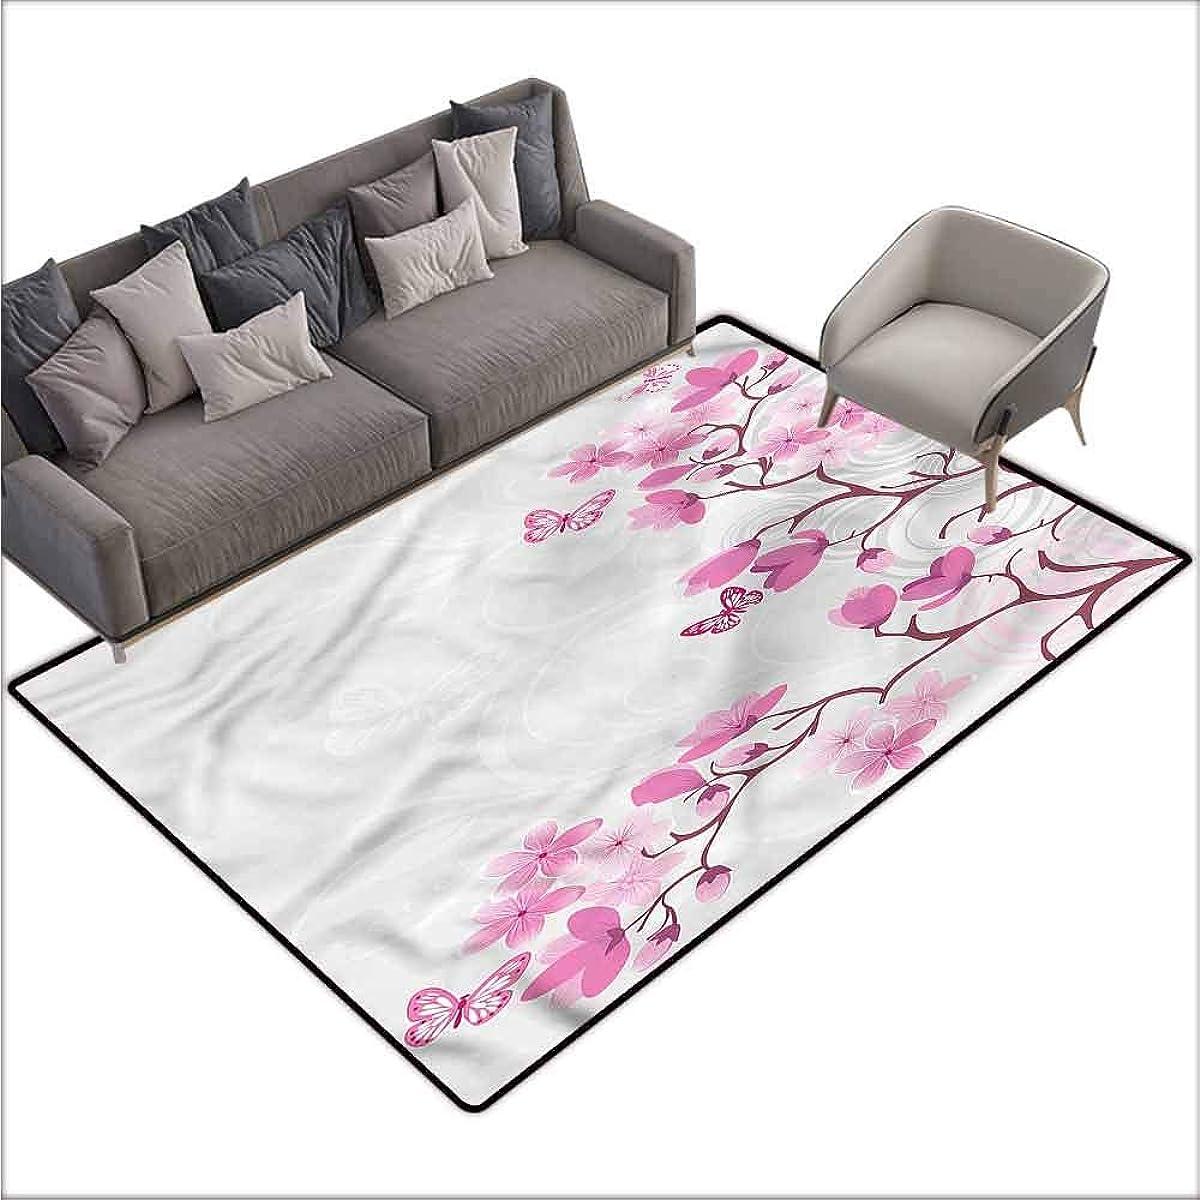 Designed Kitchen Bathroom Floor Mat Colorful Japanese,Pink Blossoms Butterflies 80